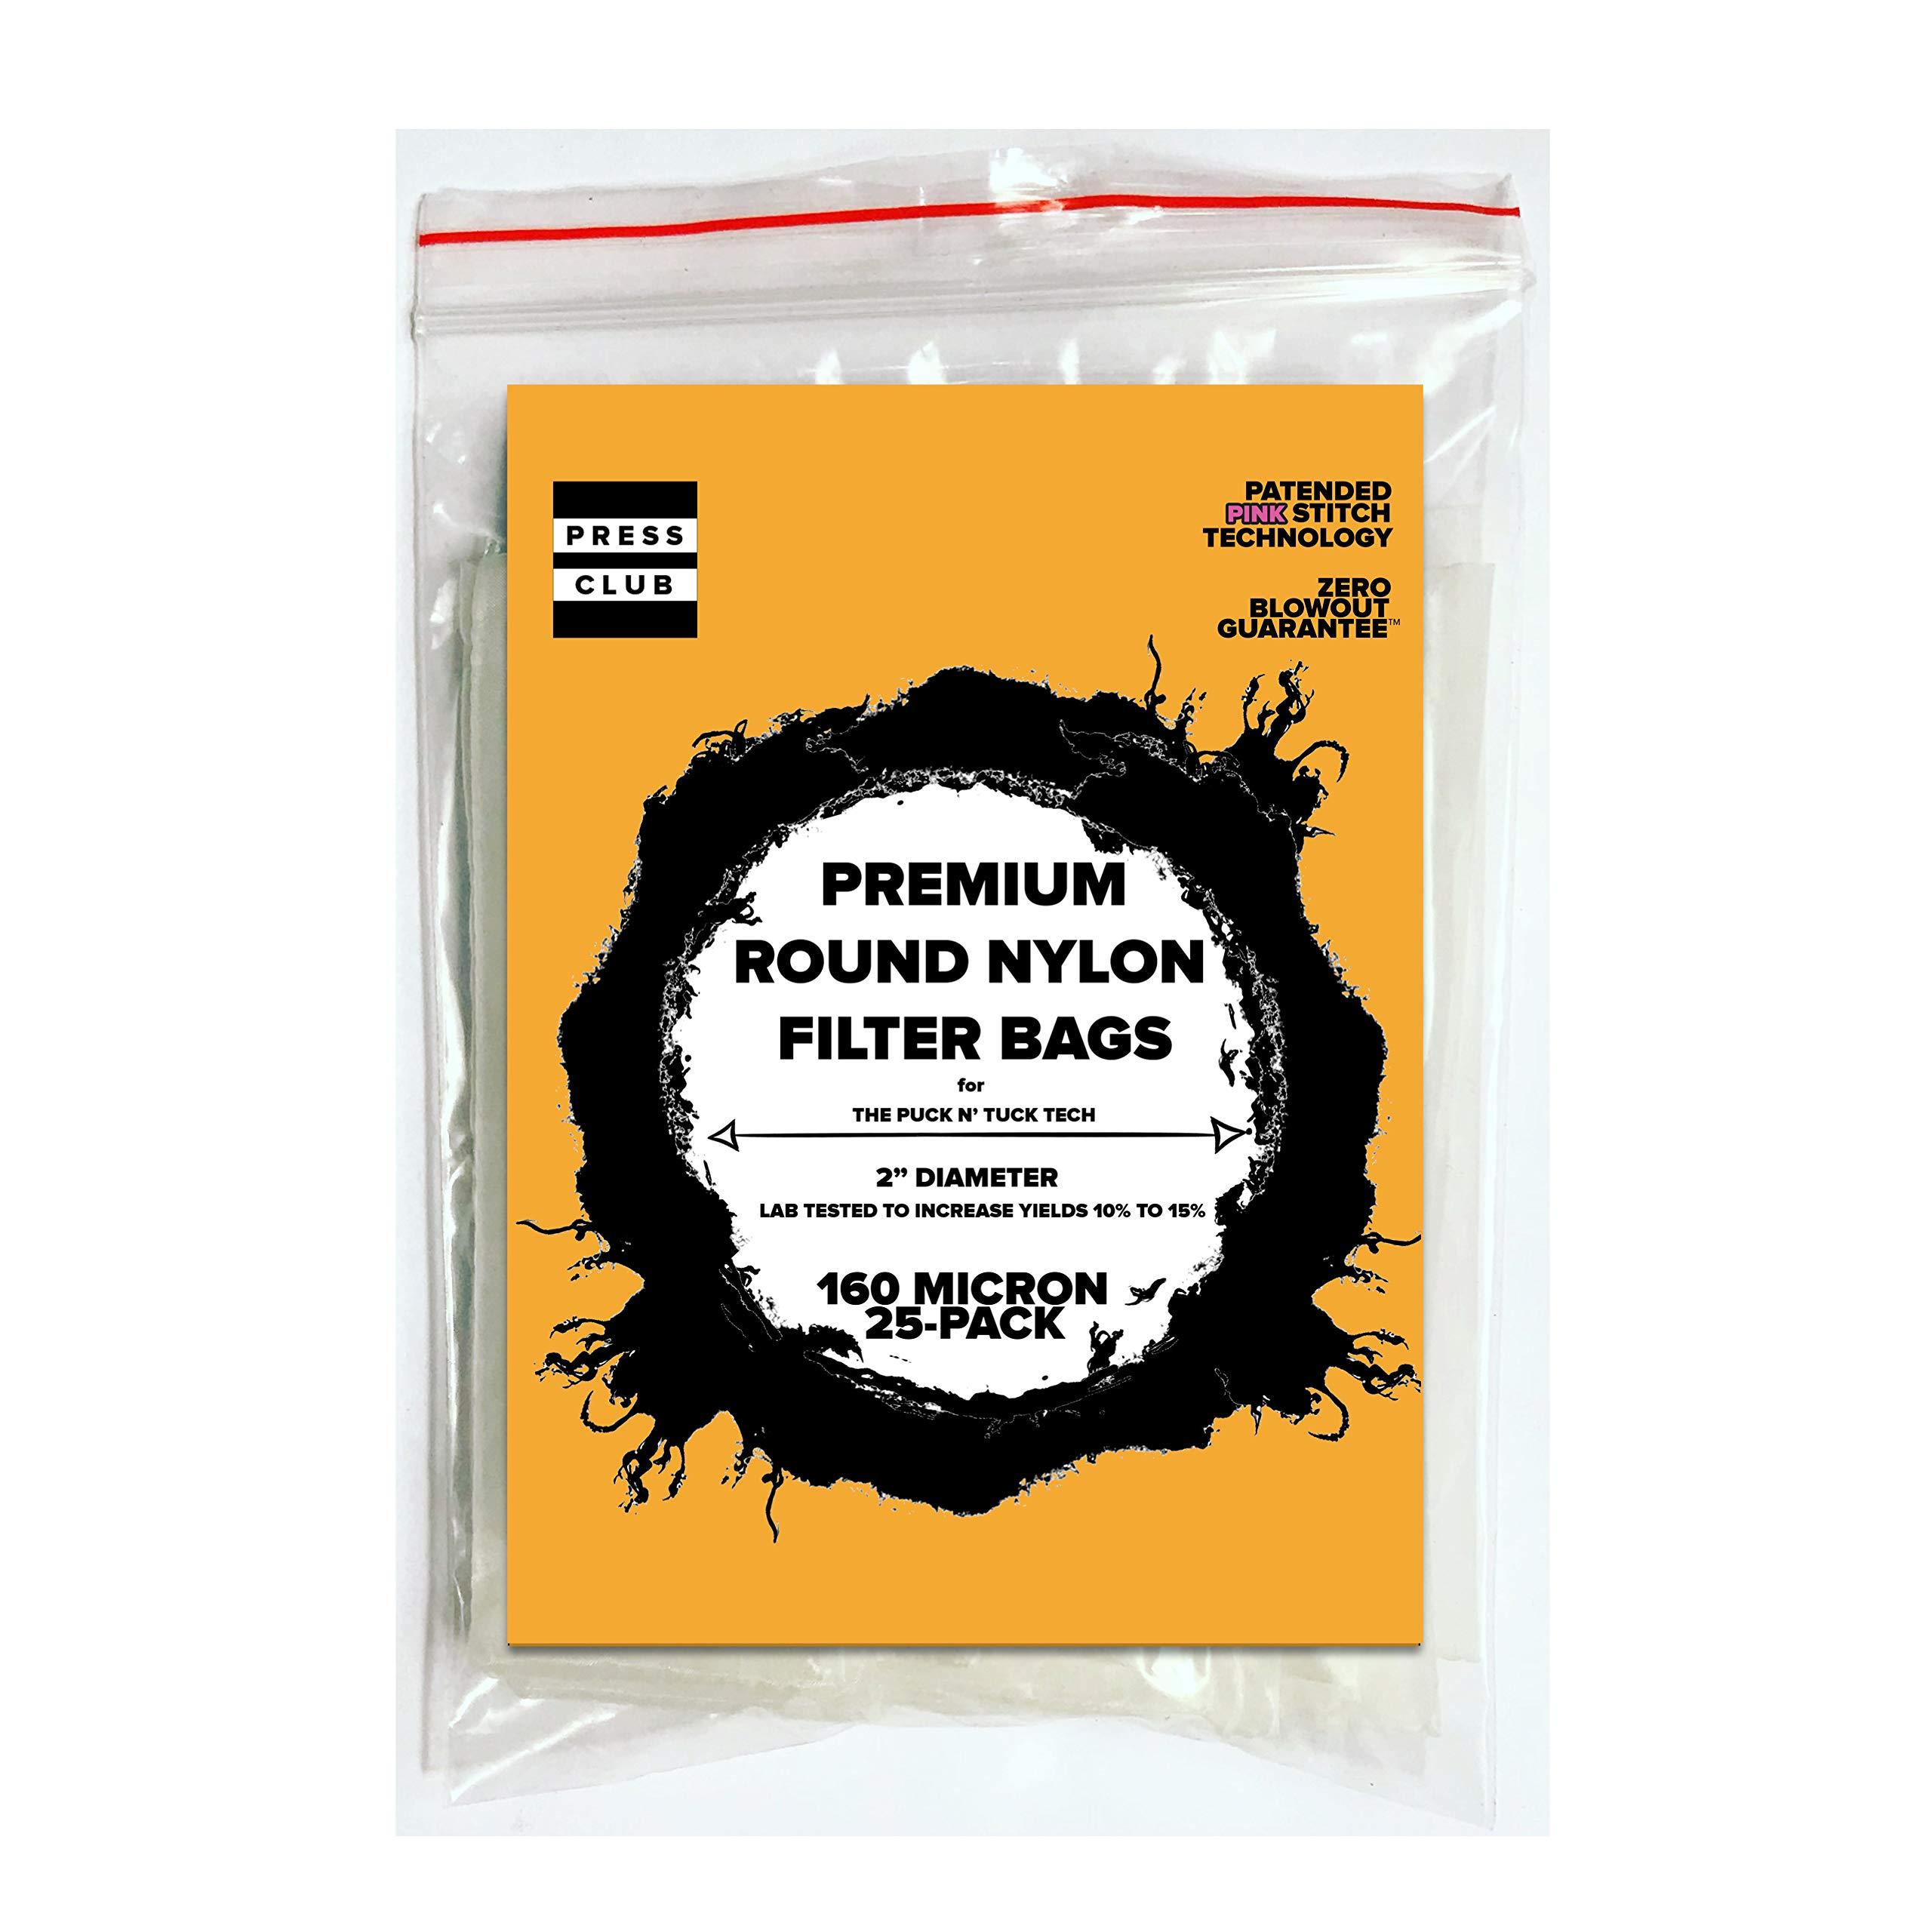 160 Micron   Premium Round Circle Nylon Tea Filter Screen Press Bag   2'' Inch Diameter   25 Pack  Zero Blowout Guarantee   All Micron & Sizes Available